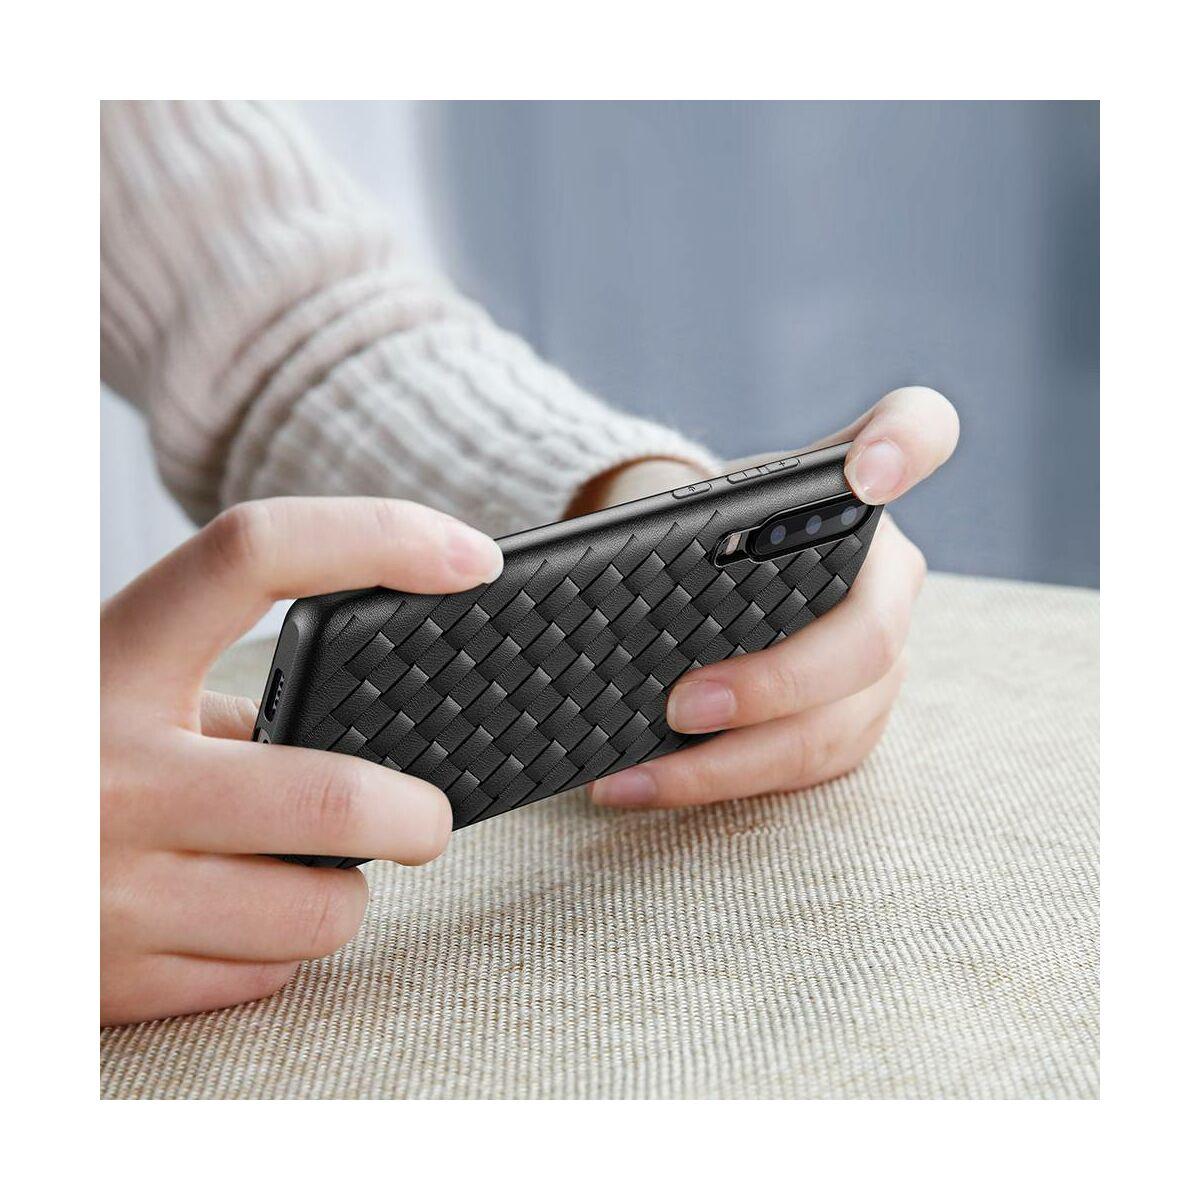 Baseus Huawei P30 tok, Weaving, fekete (WIHWP30-BV01)